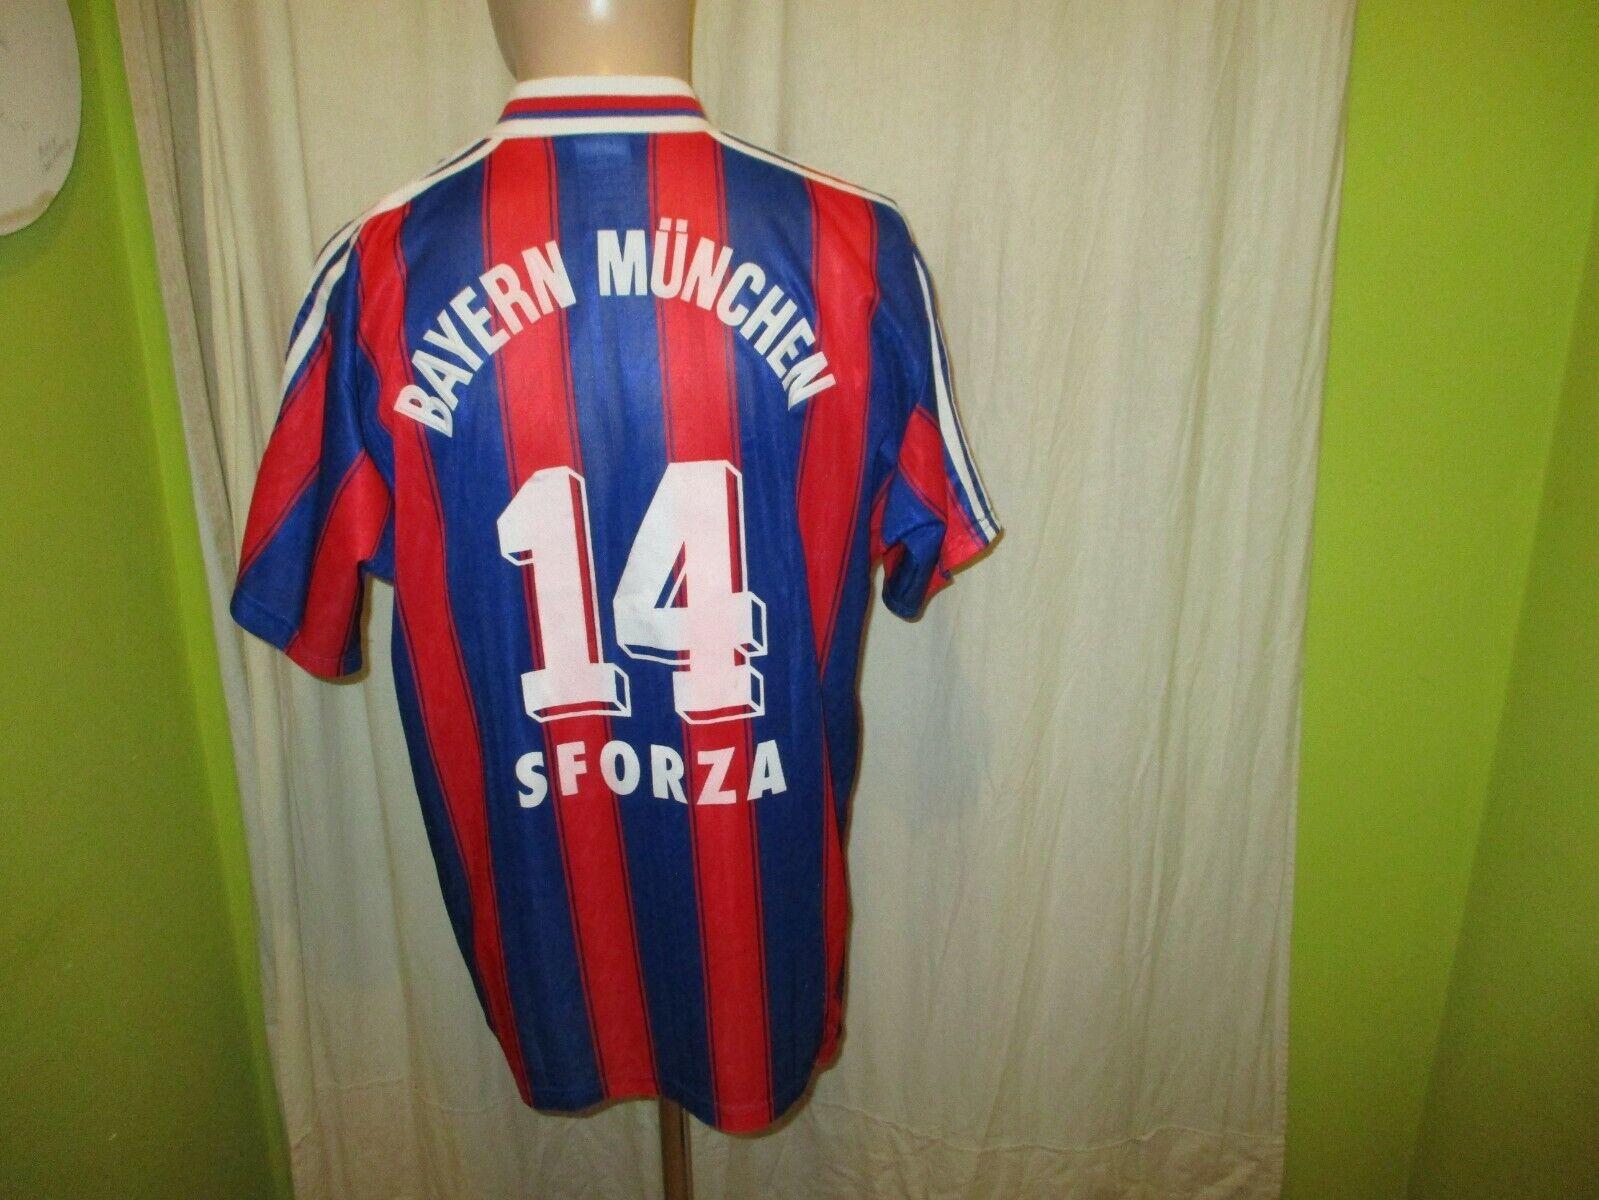 FC Bayern München Original Adidas Trikot 1995-1997 1995-1997 1995-1997  OPEL  + Nr.14 Sforza Gr.M 990578